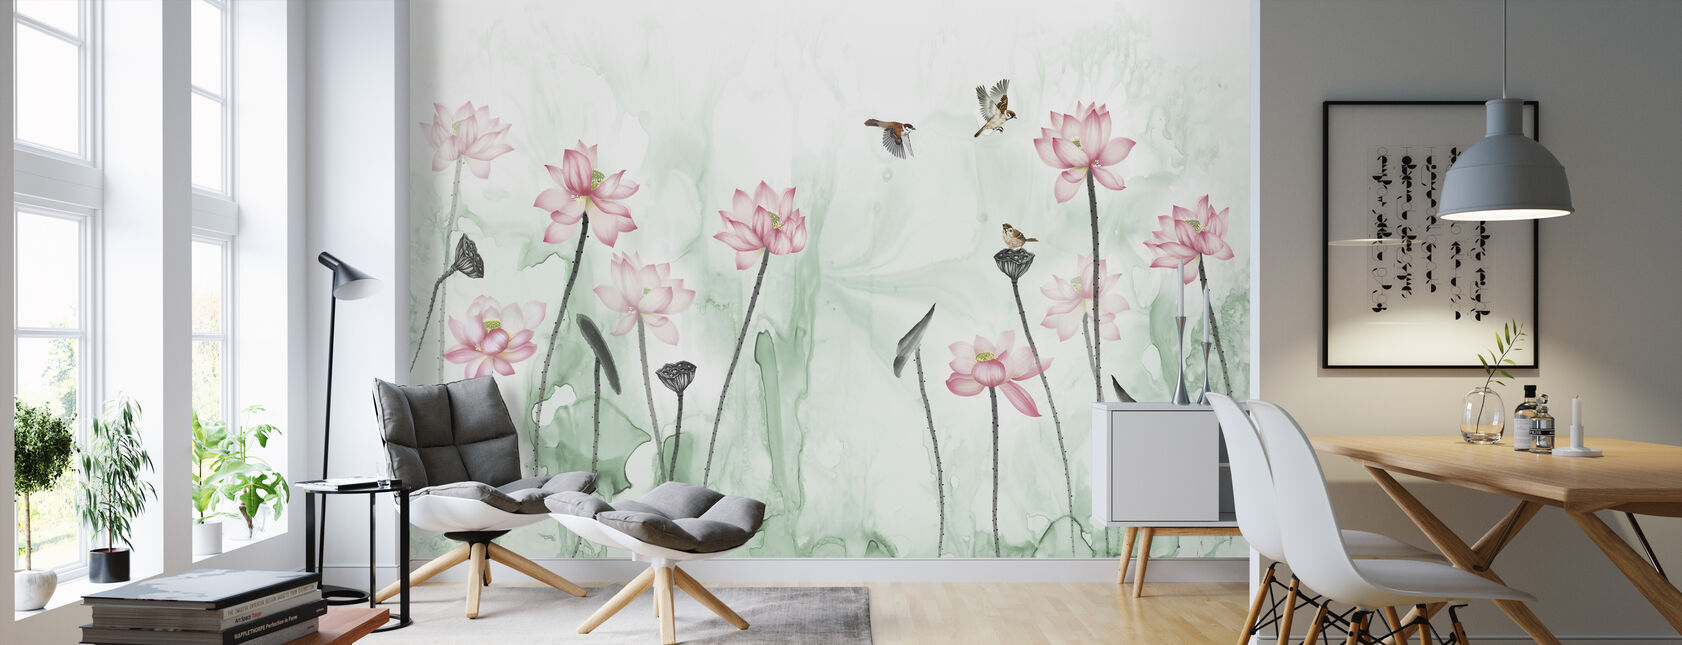 Birds and Flower Garden - Green - Wallpaper - Living Room